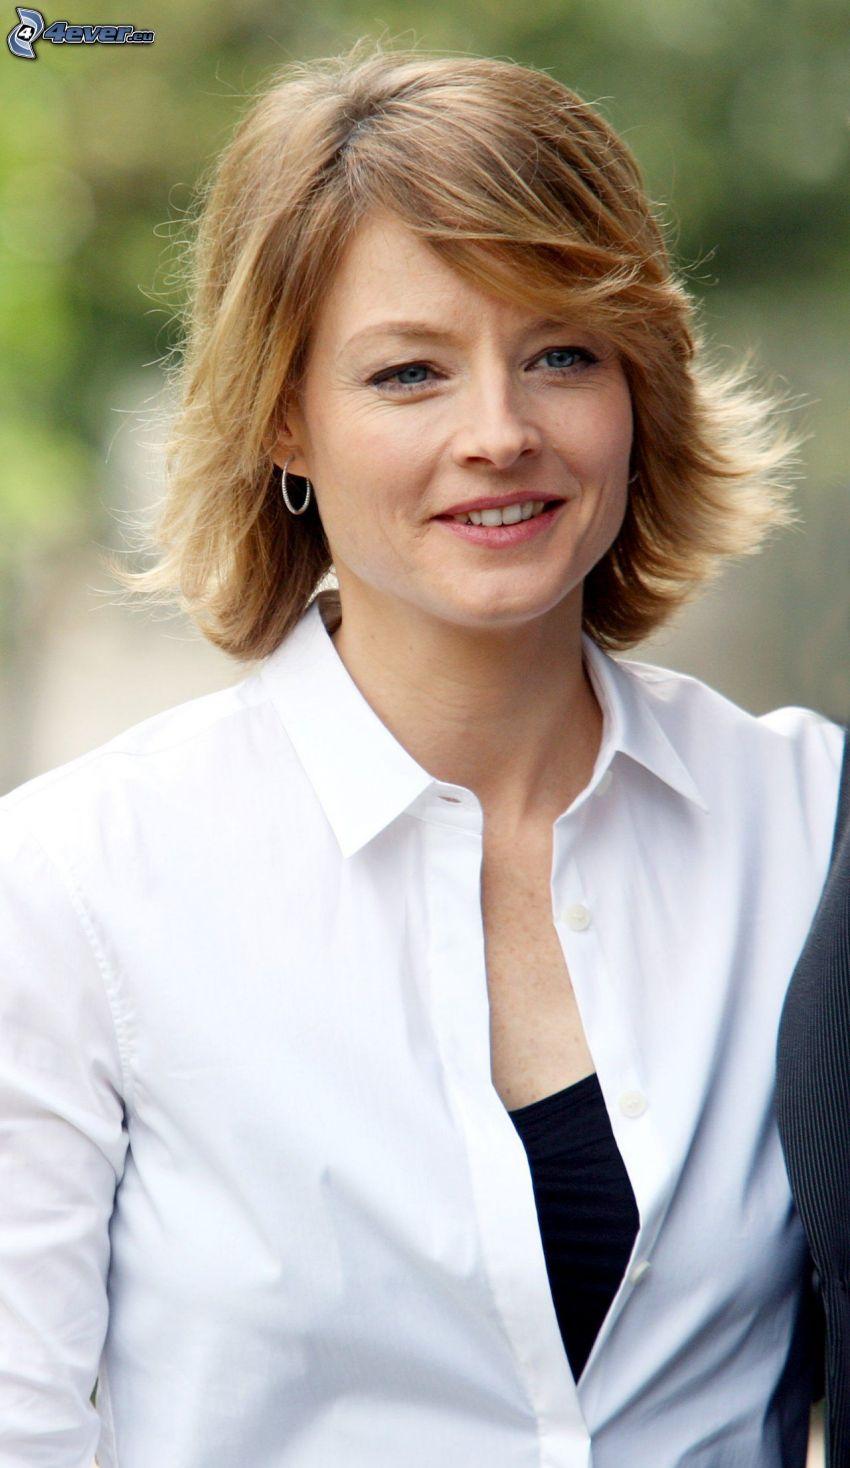 Jodie Foster, camicia bianca, sorriso